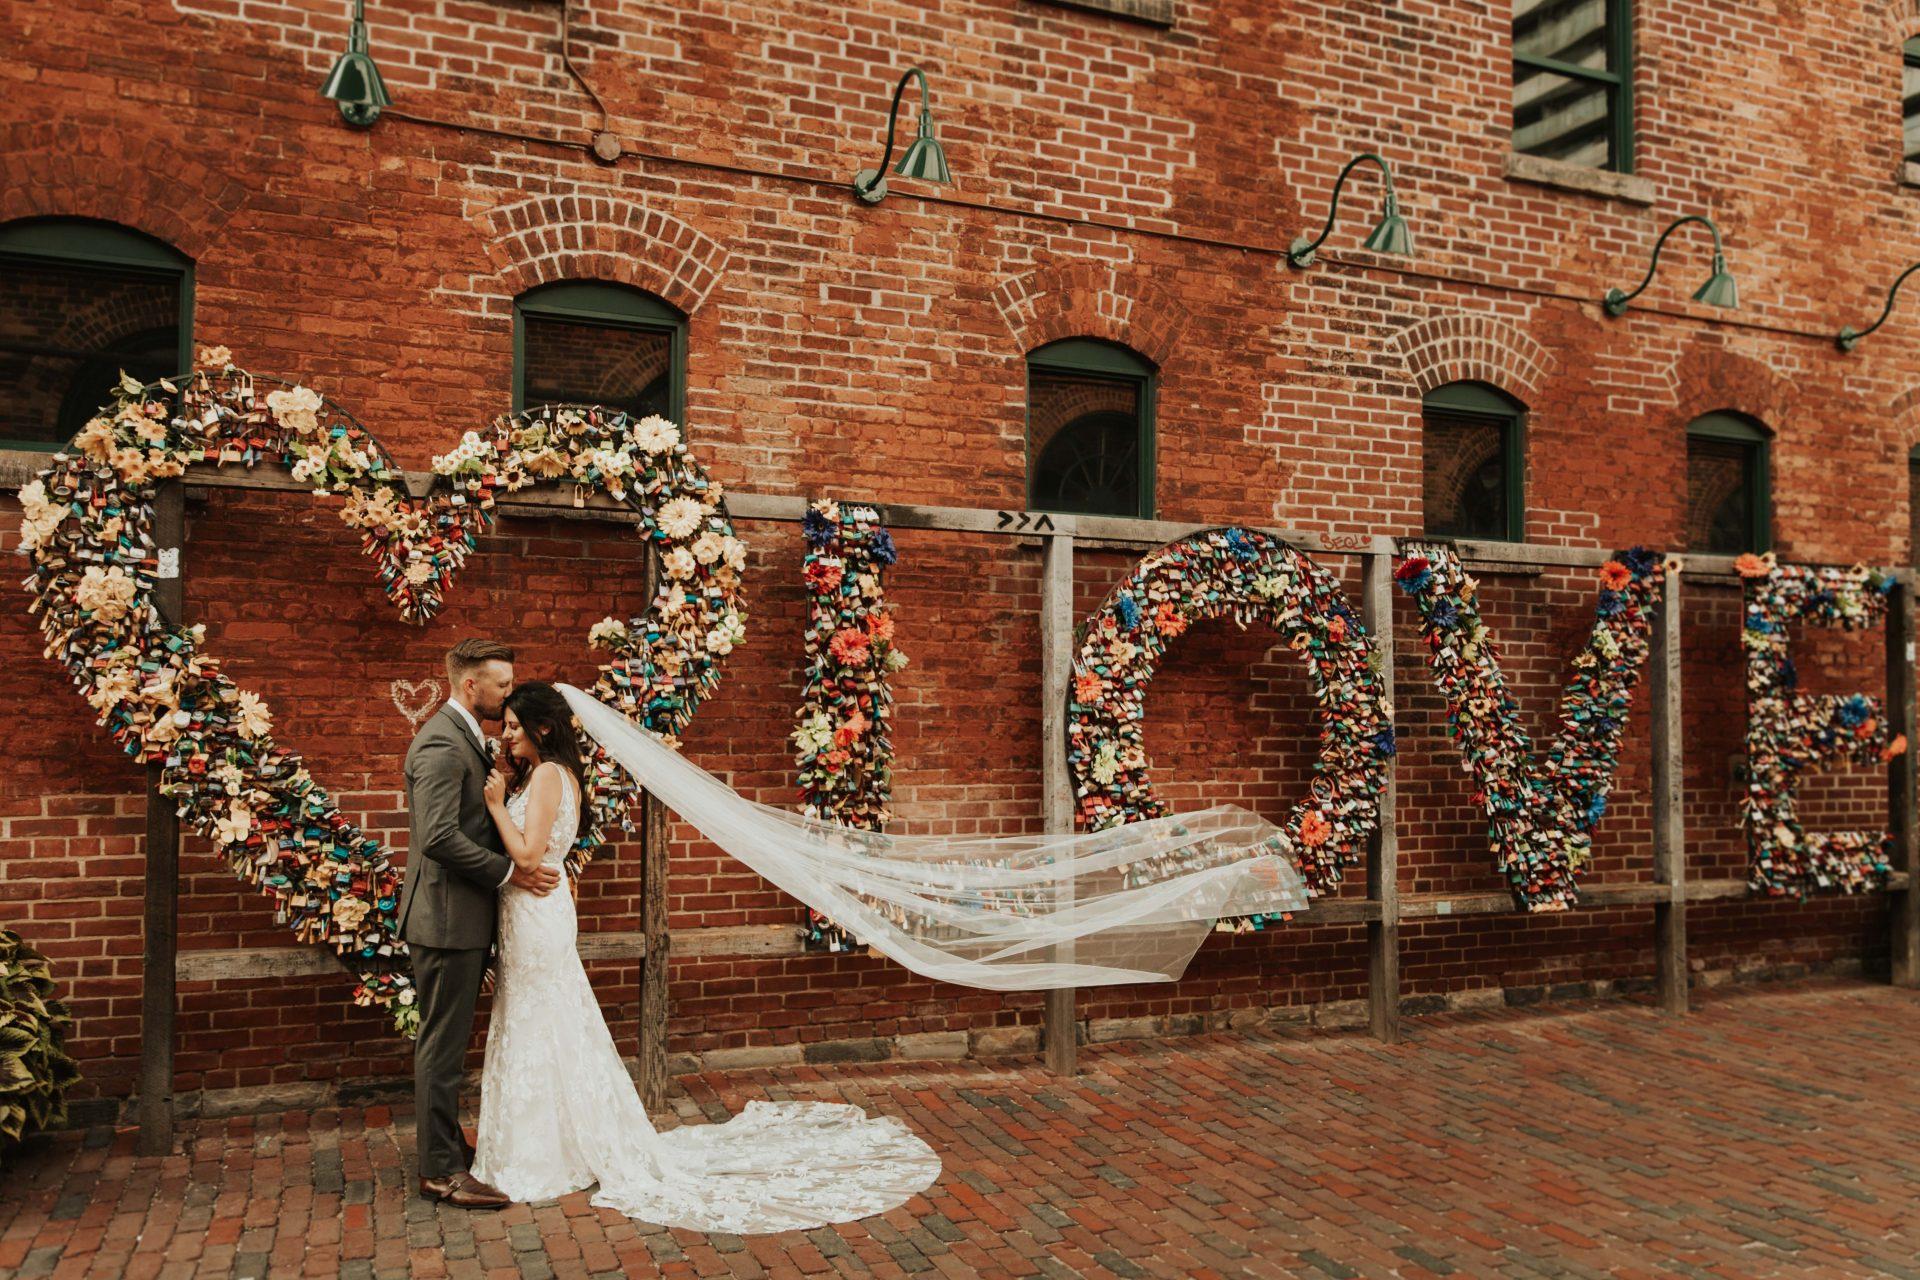 toronto distillery district love locks wedding photo